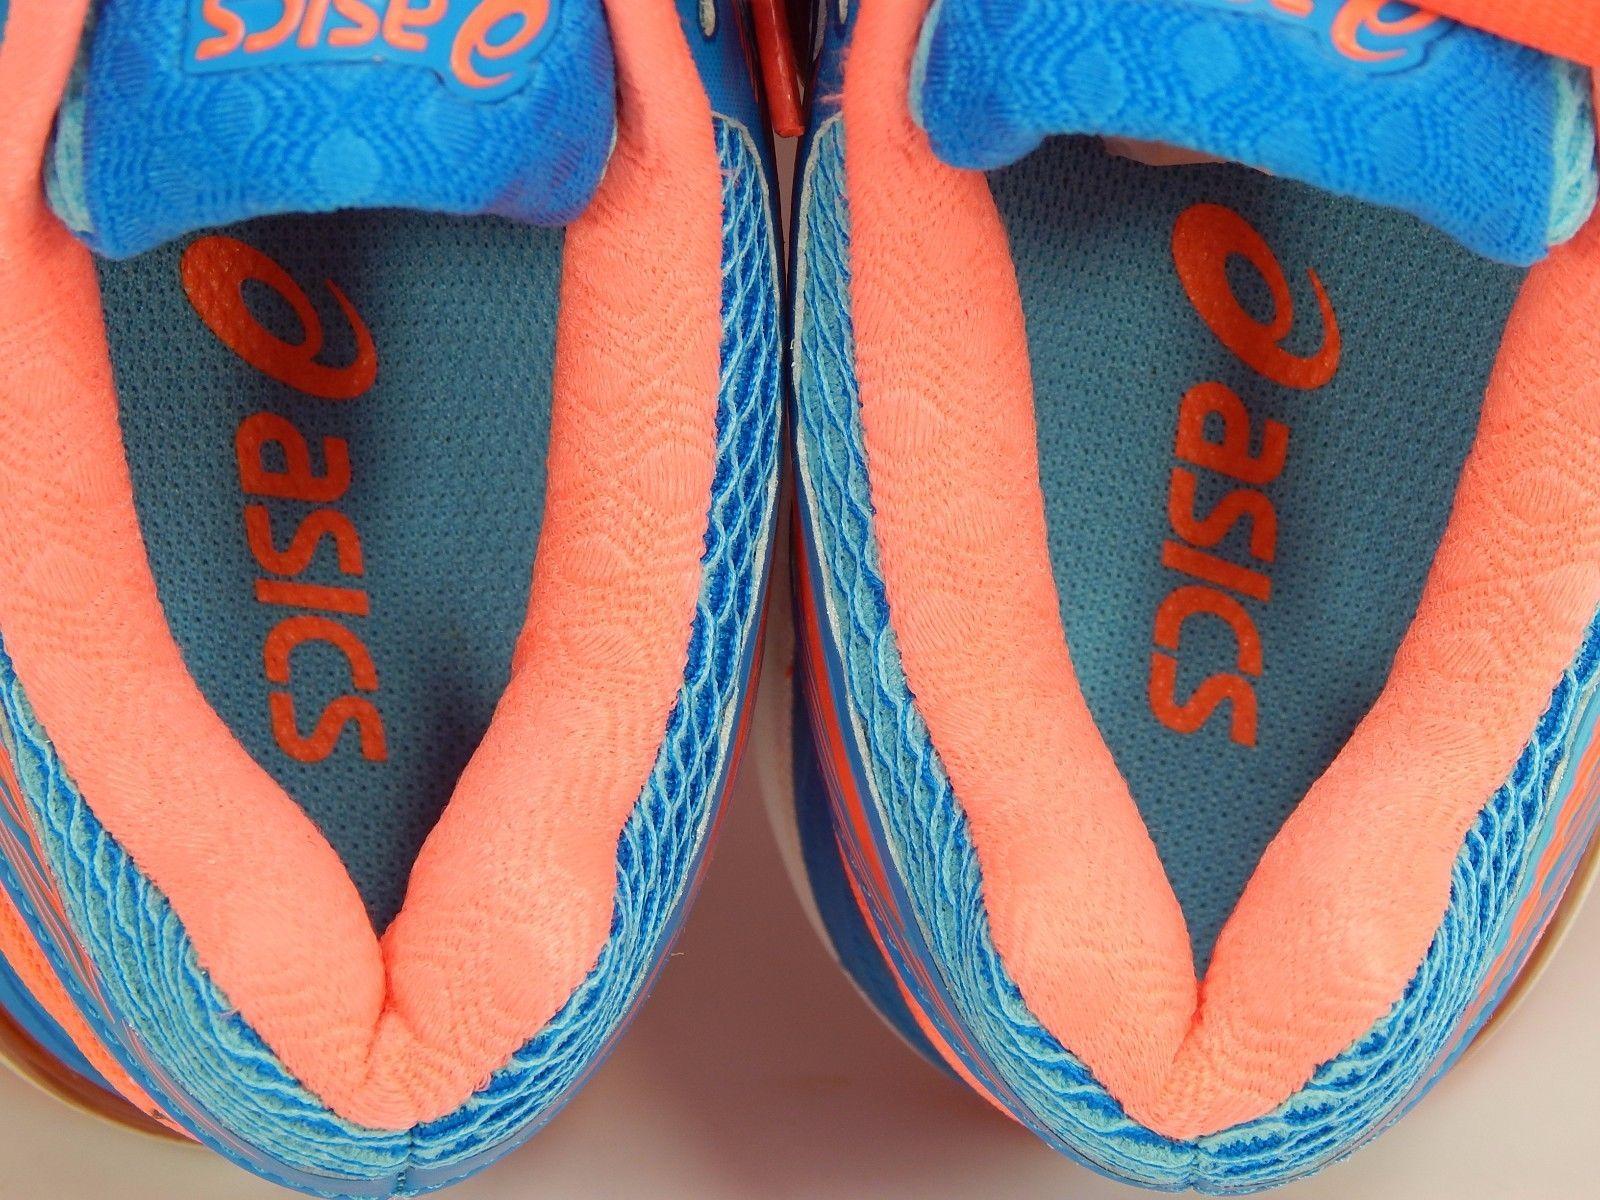 Asics Gel Cumulus 18 Women's Running Shoes Size US 7 M (B) EU 38 Blue T6C8N